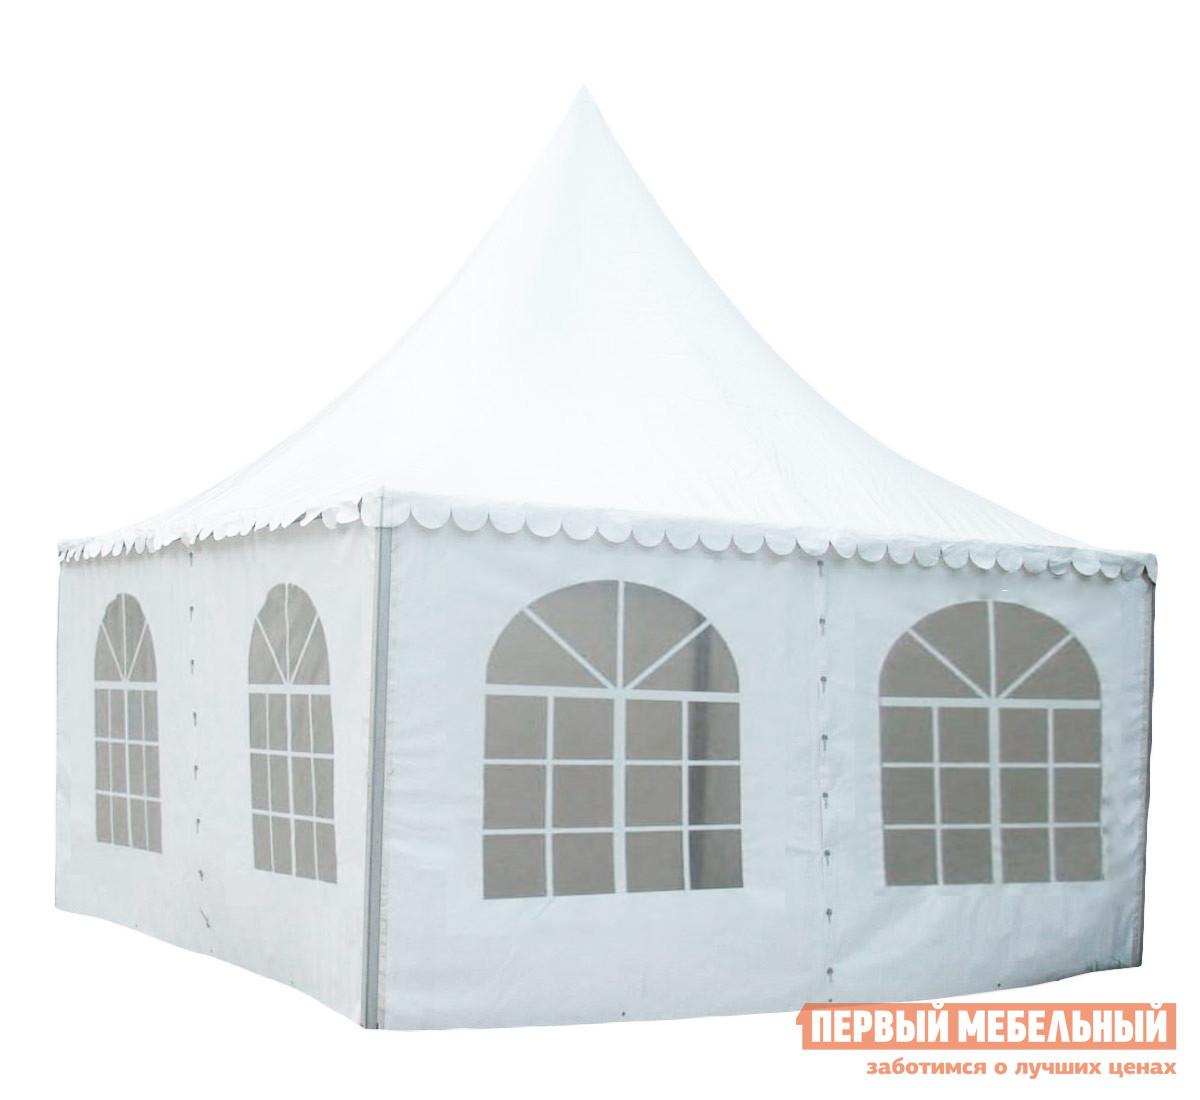 Шатер-пагода для мероприятий Giza Garden Азарина 6х6 раздвижной шатер гармошка giza garden гиза эко 3х3